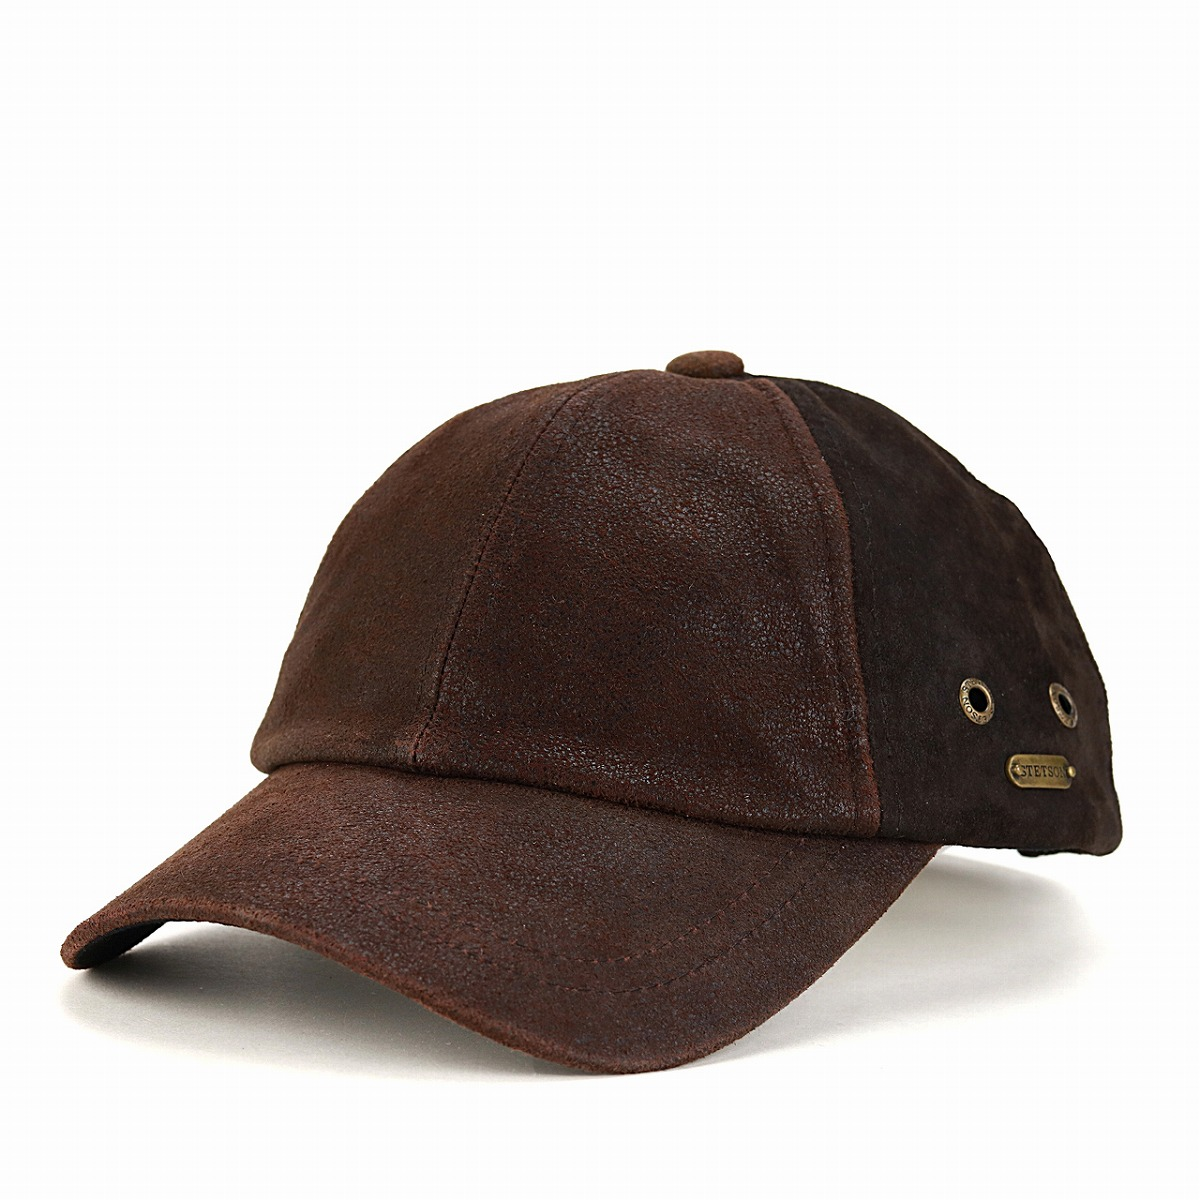 ... STETSON leather cap men hat baseball cap Lady s cap Stetson cap genuine  leather cold protection Shin ... 06379a30da8